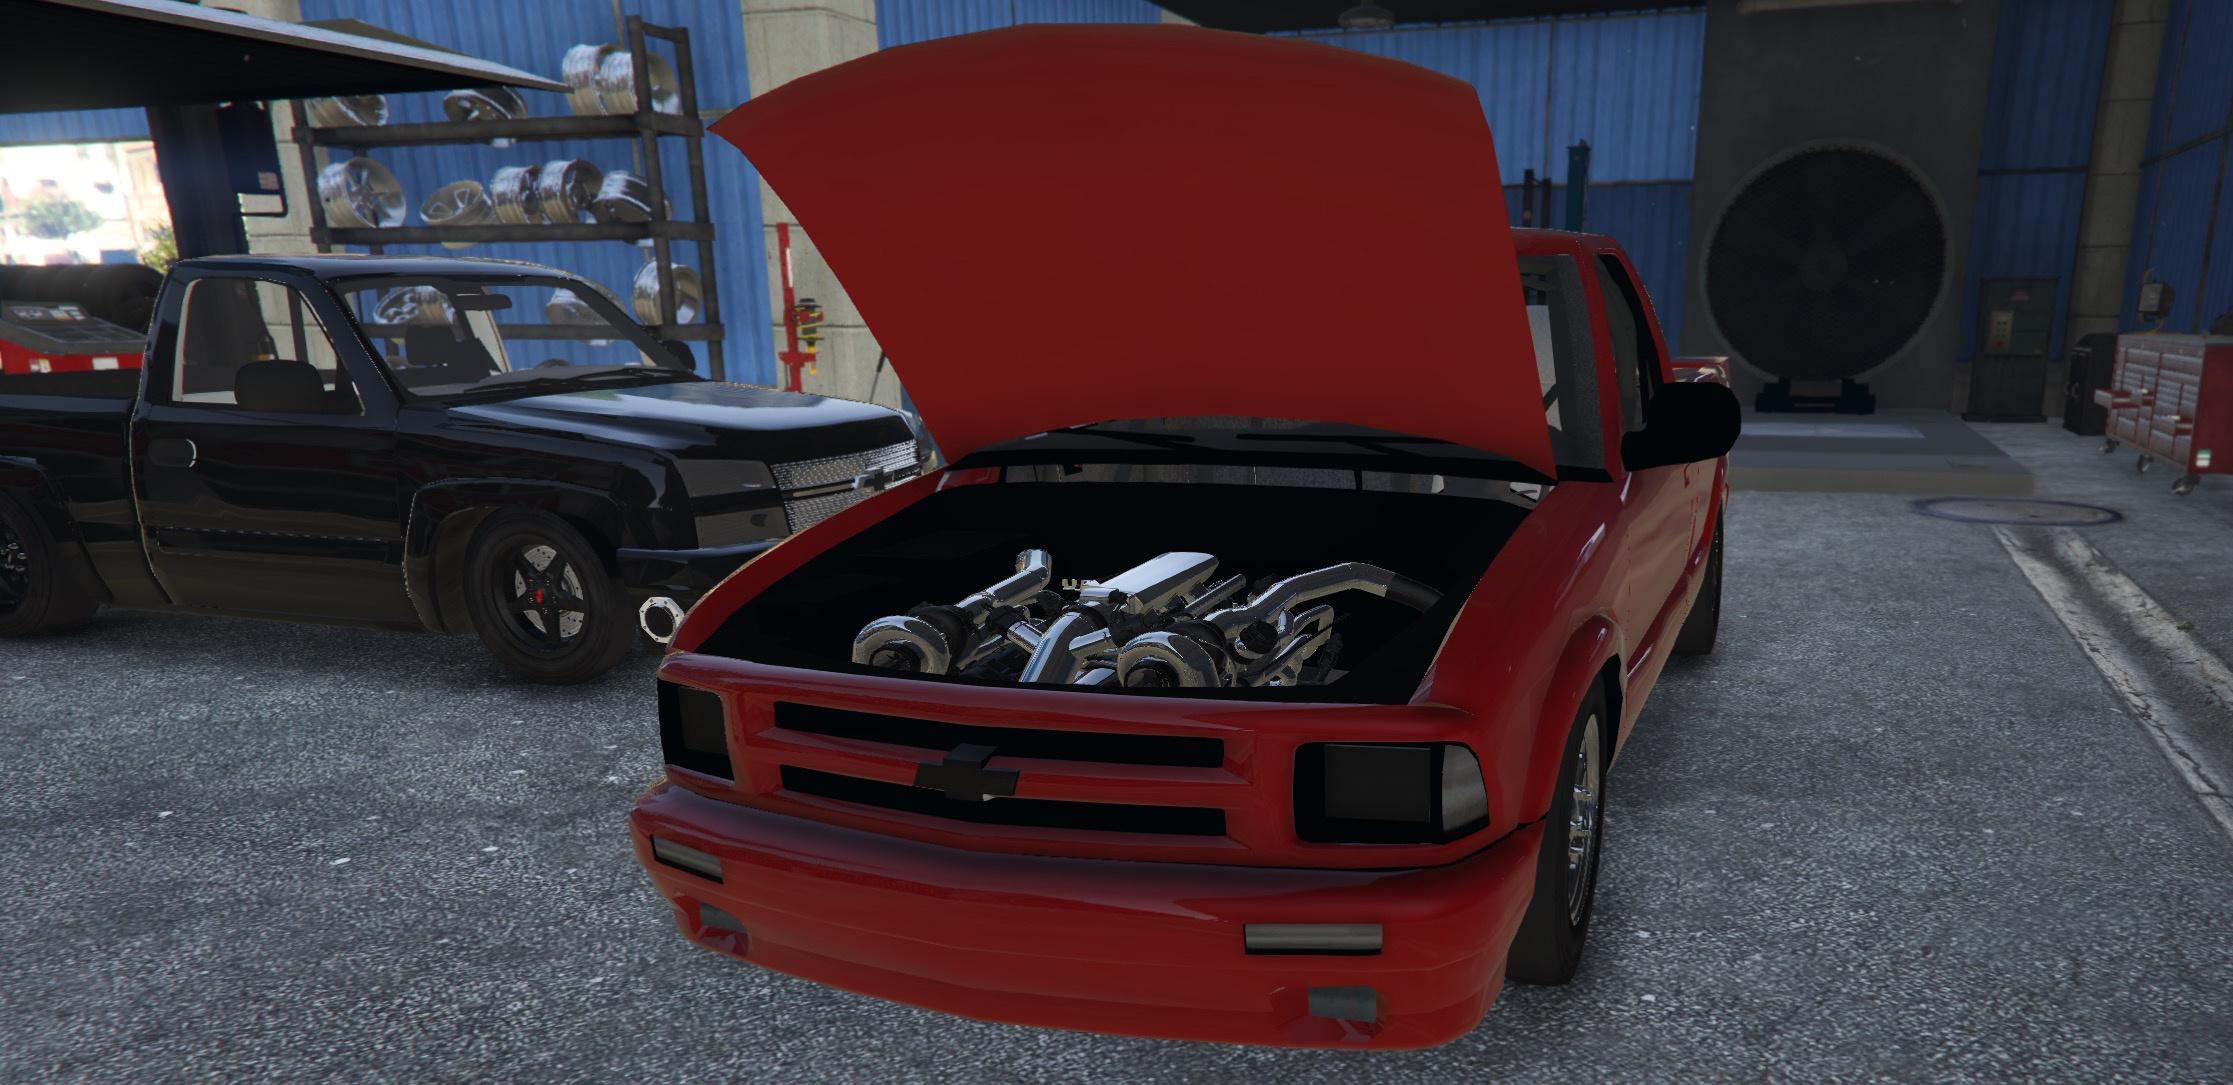 1996 Chevy S10 Drag [FIVEM Add-On|Replace] - GTA5-Mods com